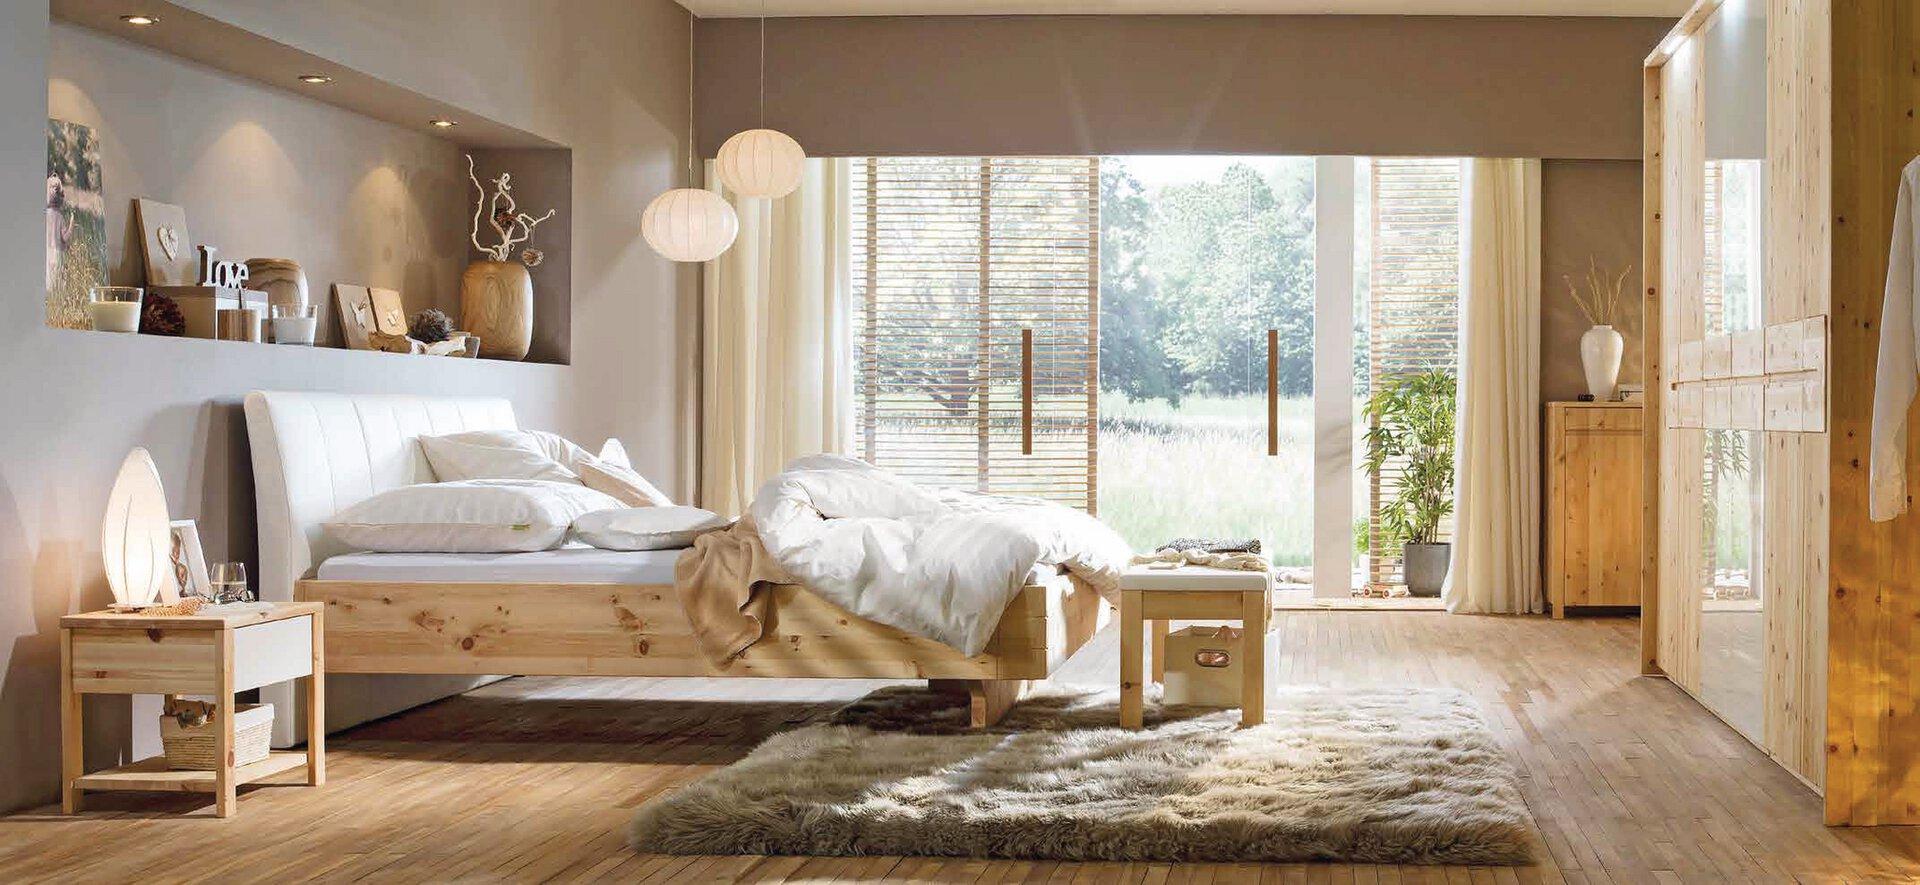 Schlafzimmer CEMBRA Lip Pohistvo Holz braun